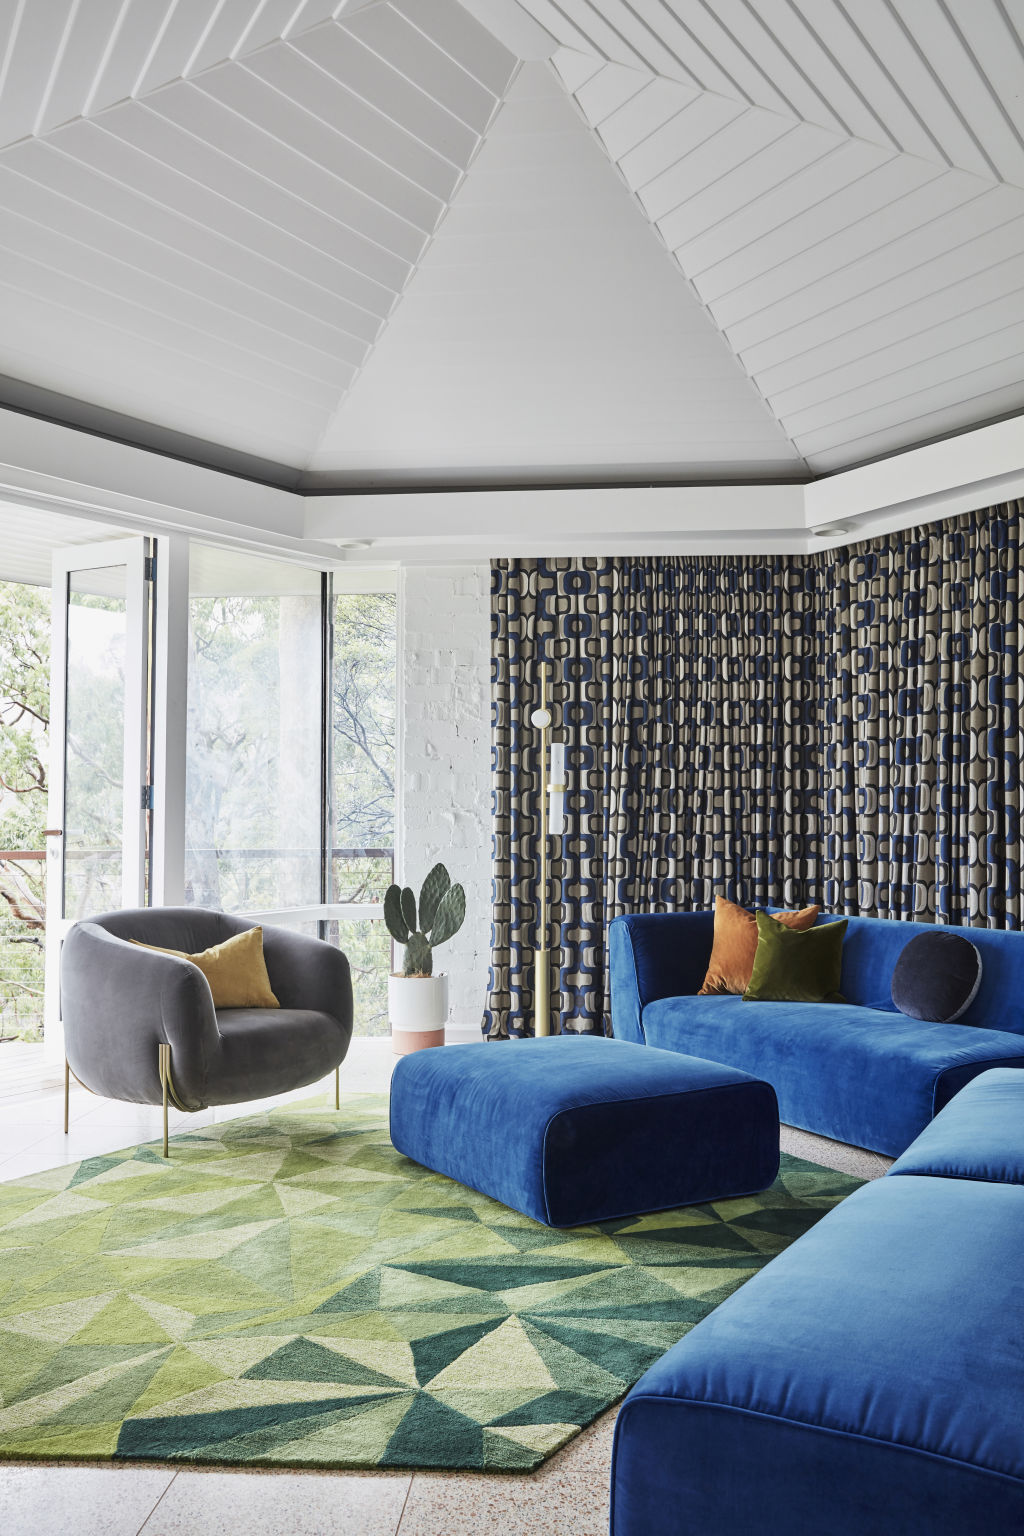 Tree House. Interiors: Studio Trio. Styling: Studio Trio